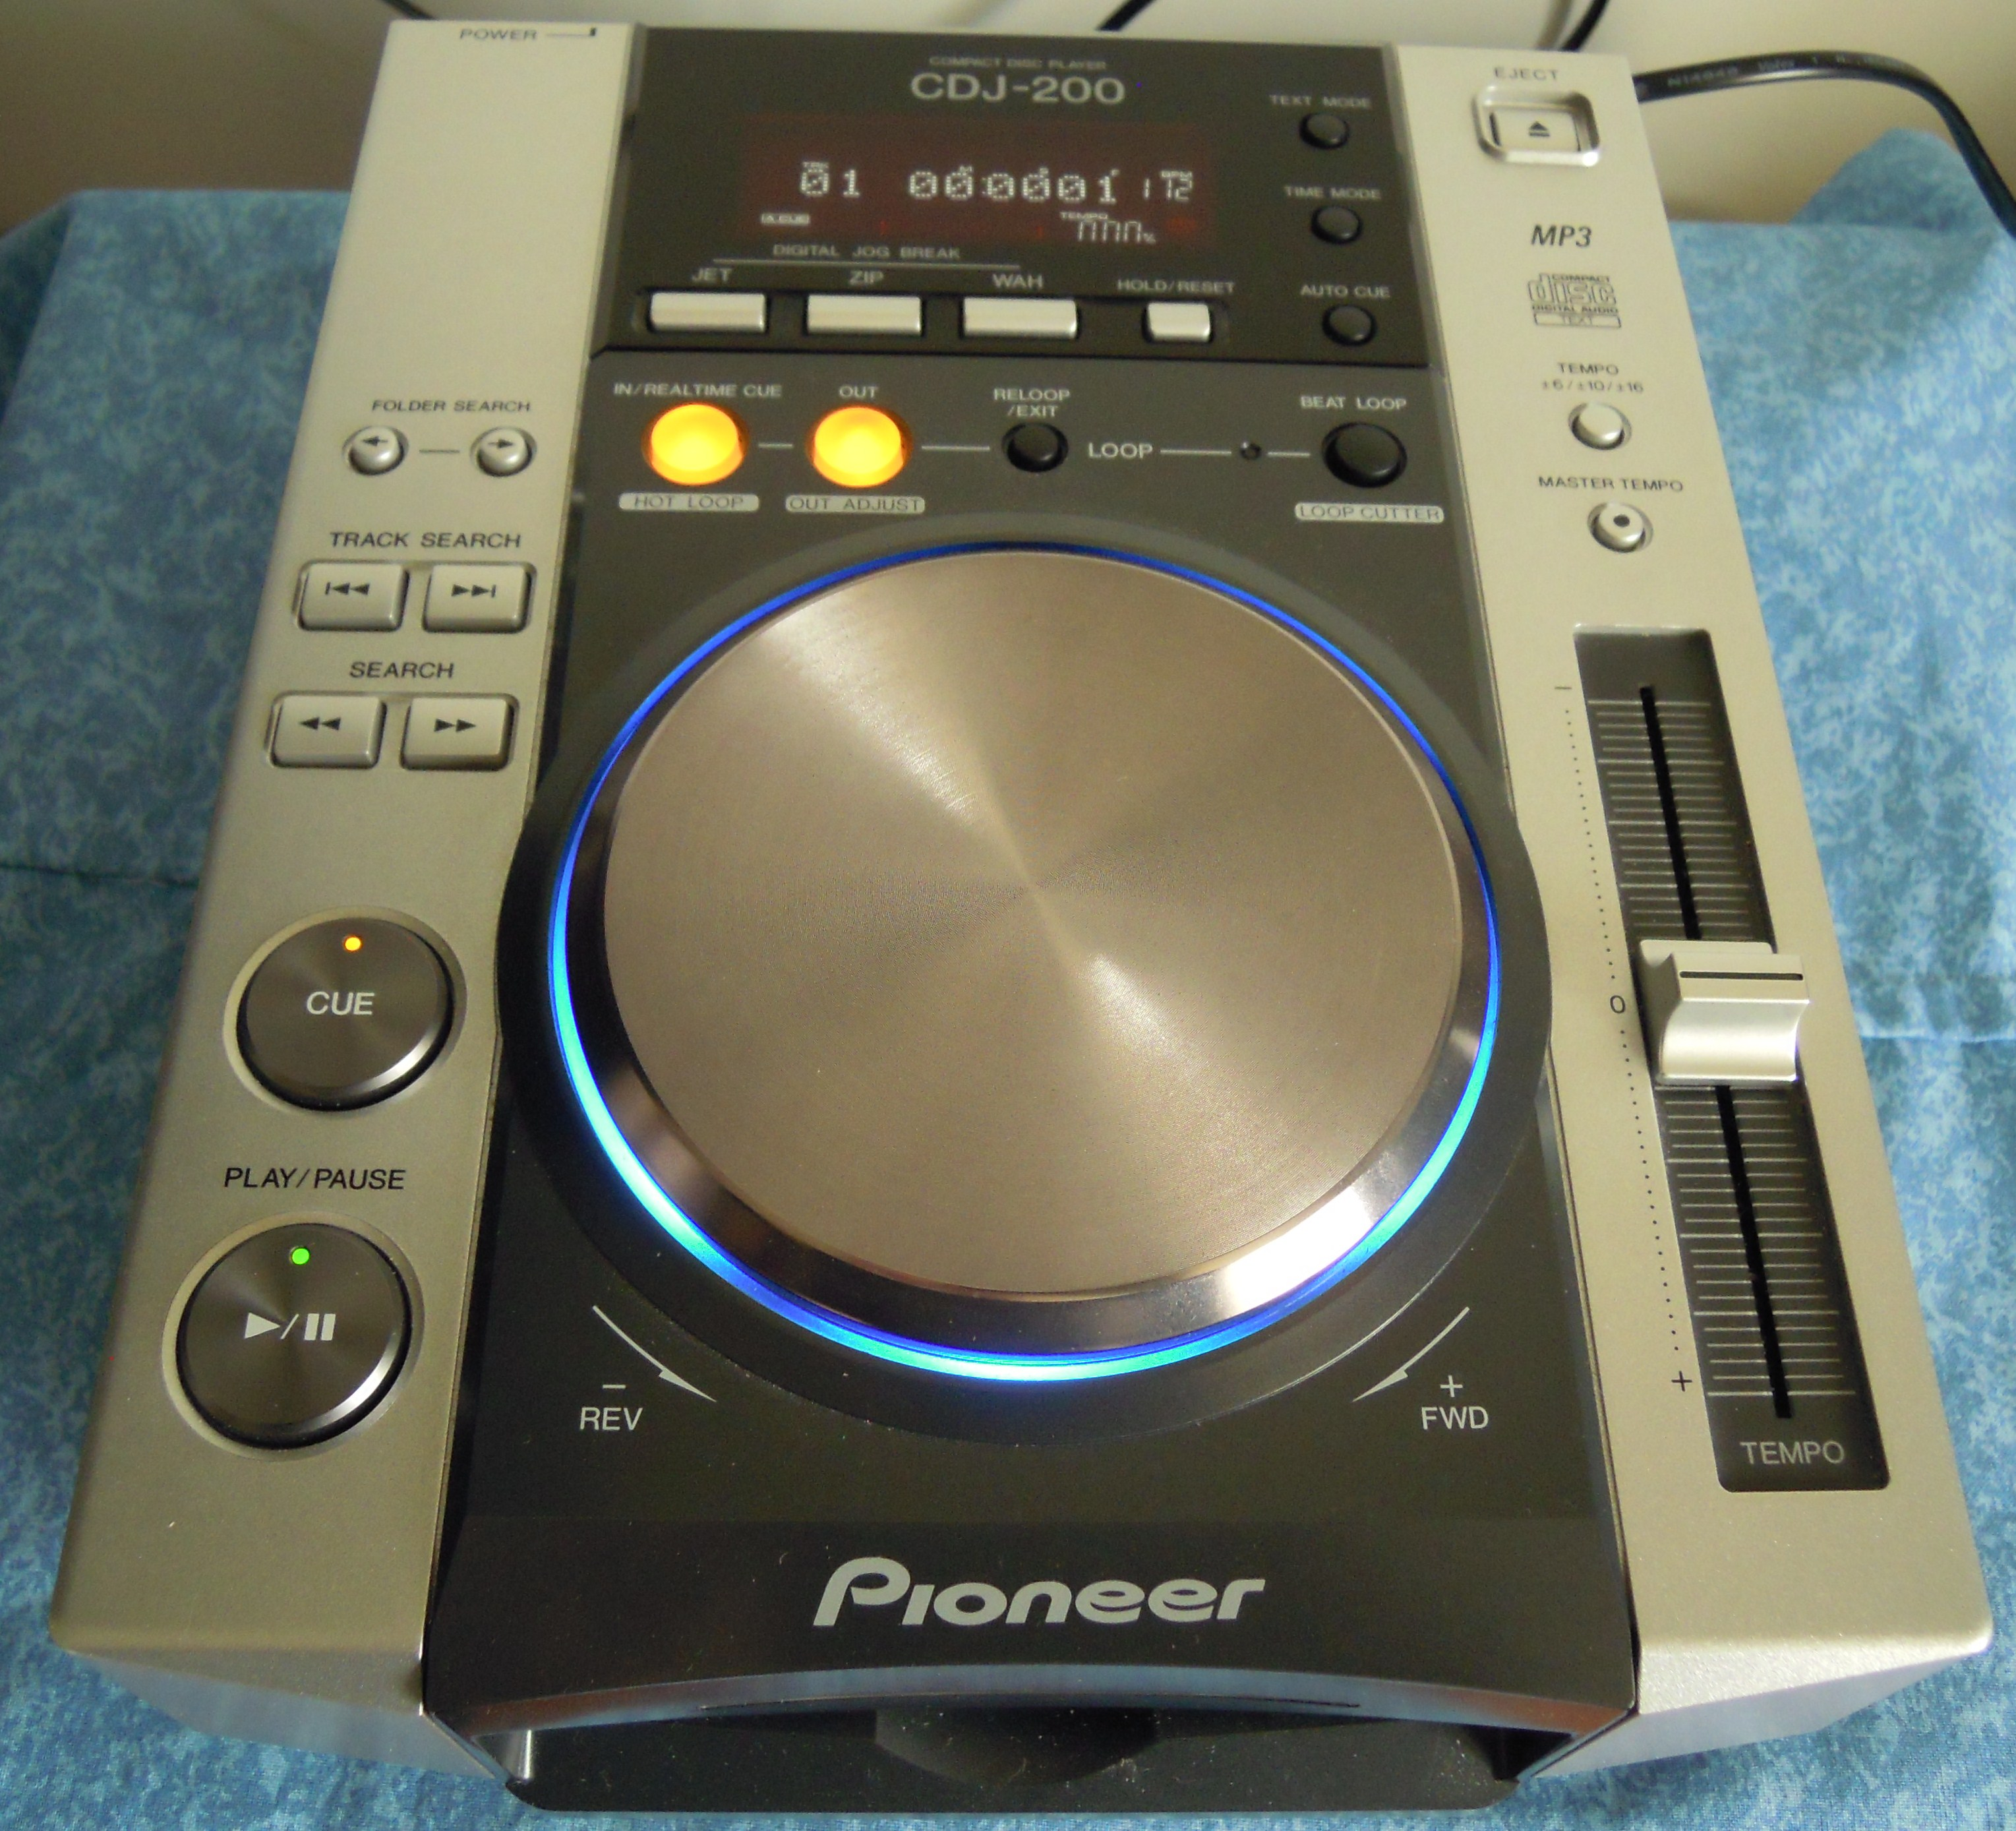 pioneer cdj 200 image 488682 audiofanzine. Black Bedroom Furniture Sets. Home Design Ideas